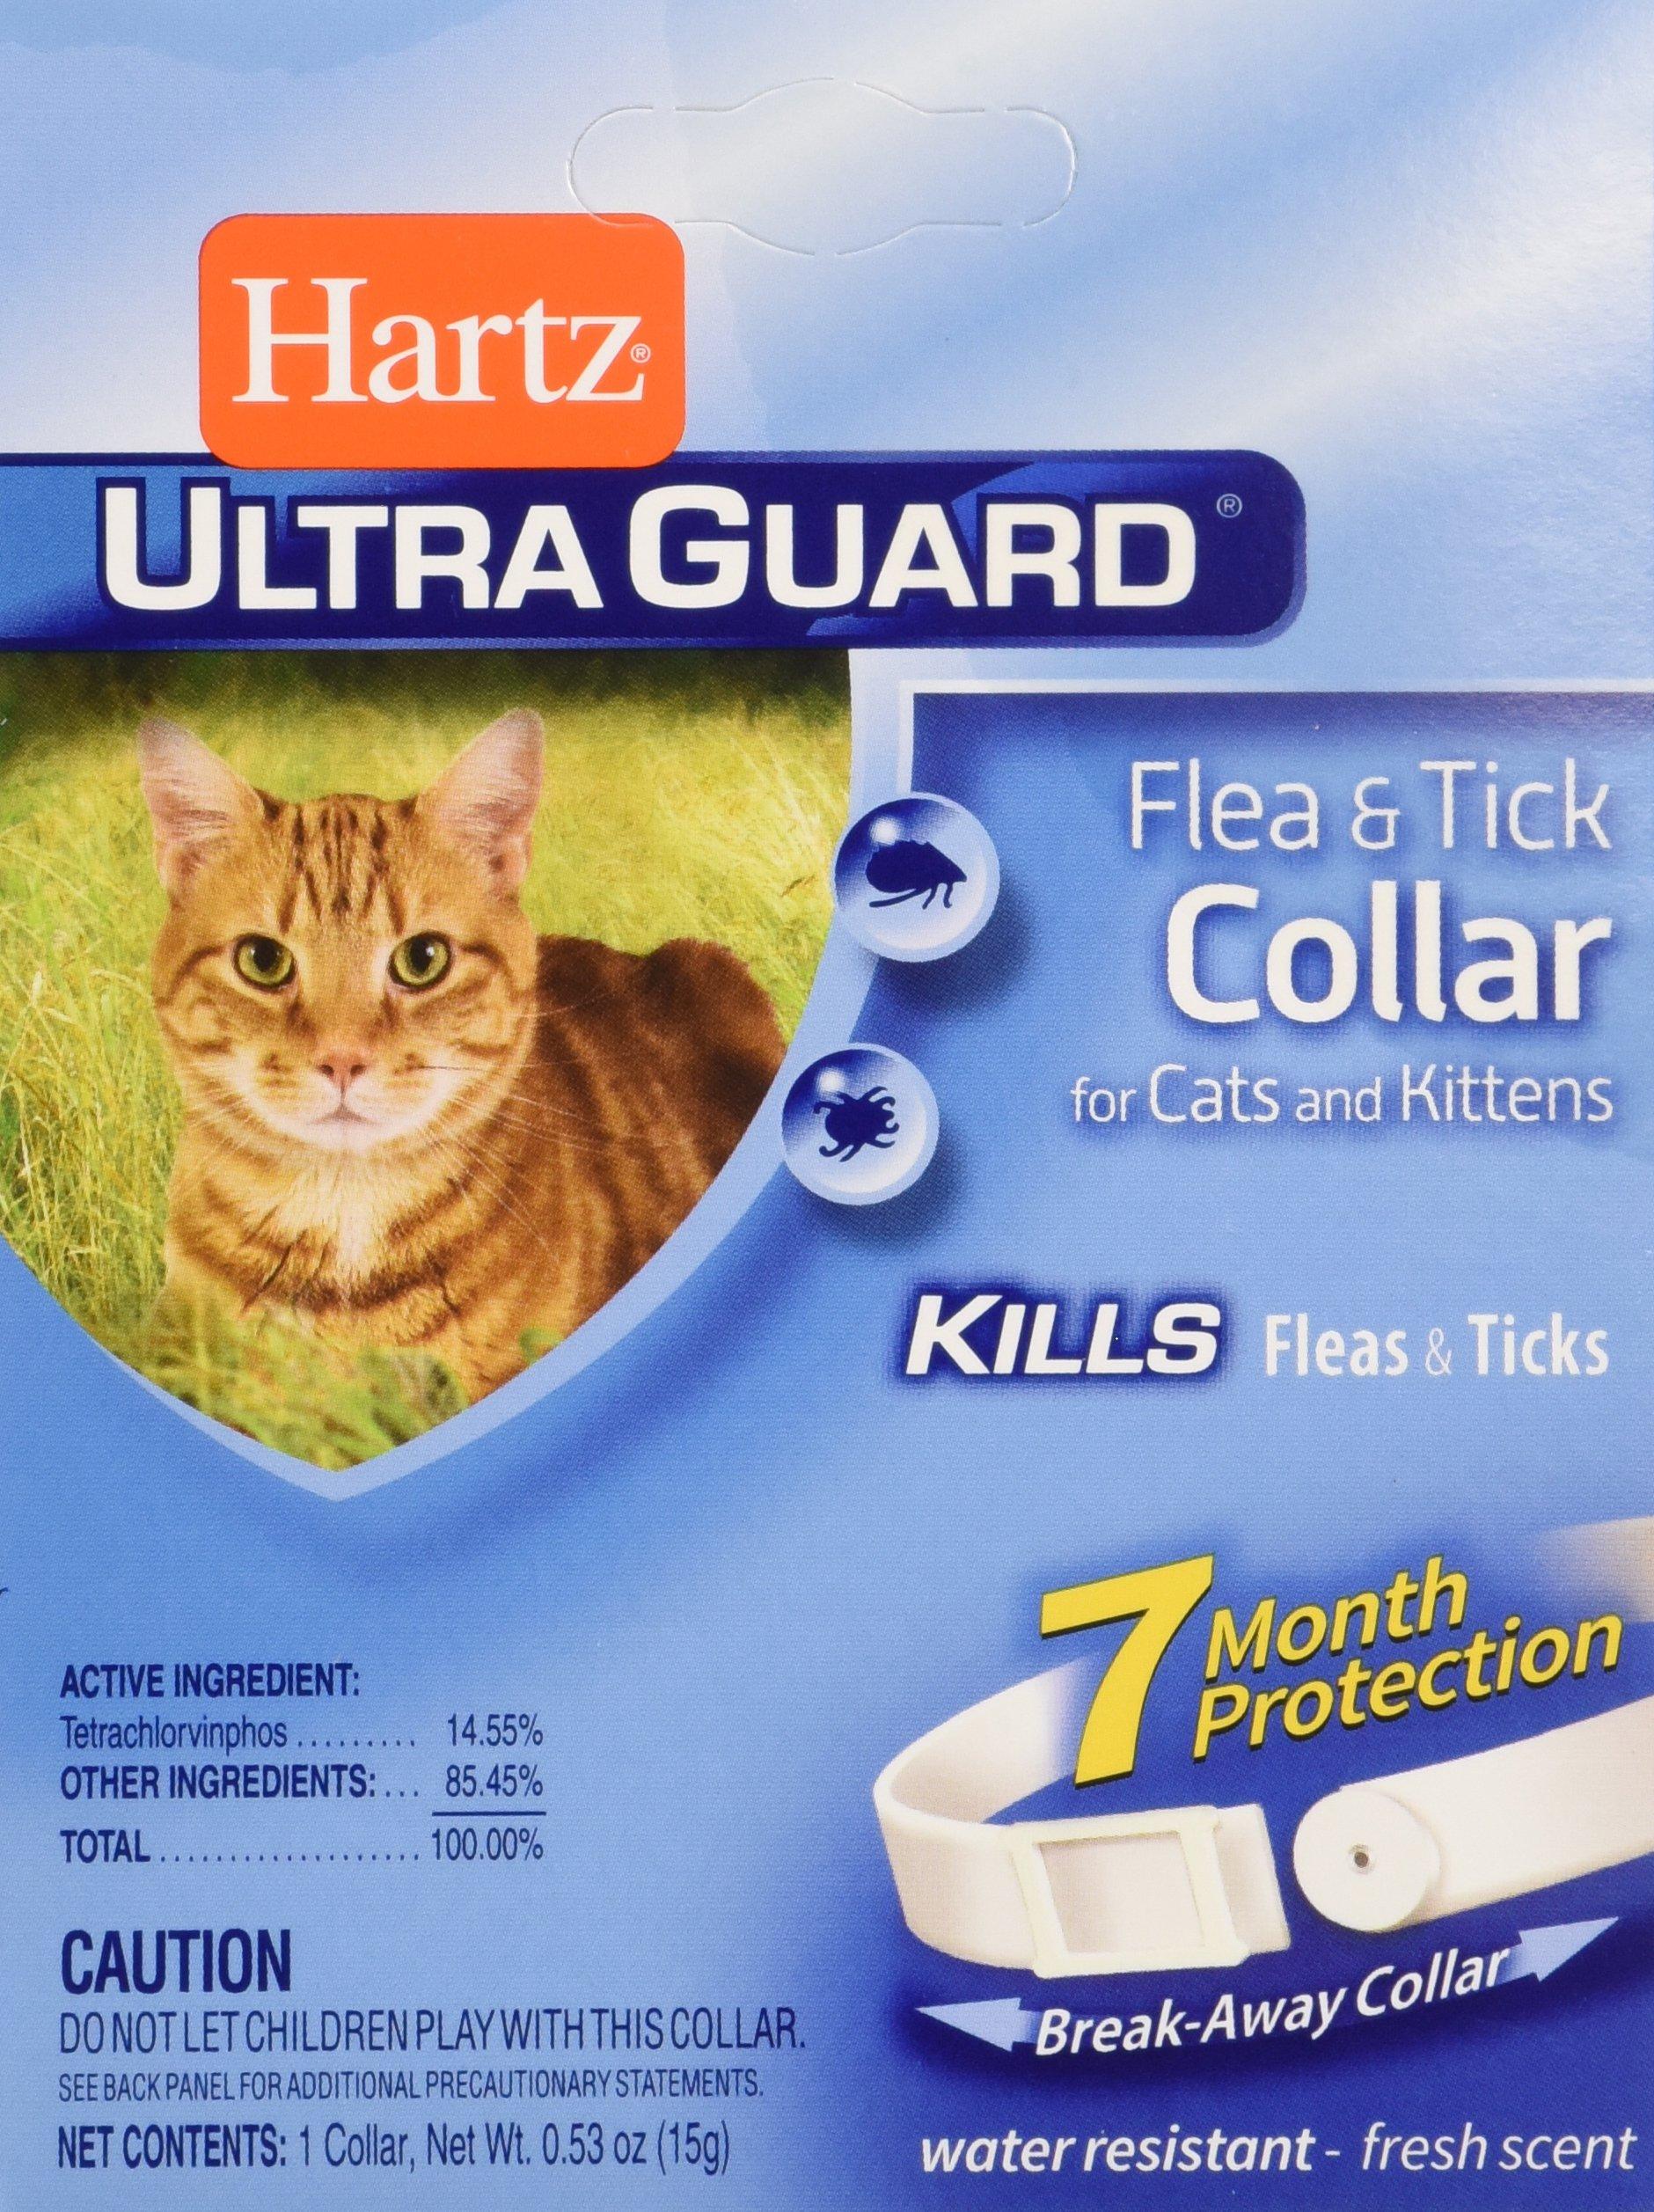 UltraGuard Plus Flea And Tick Kitten And Cat Collar